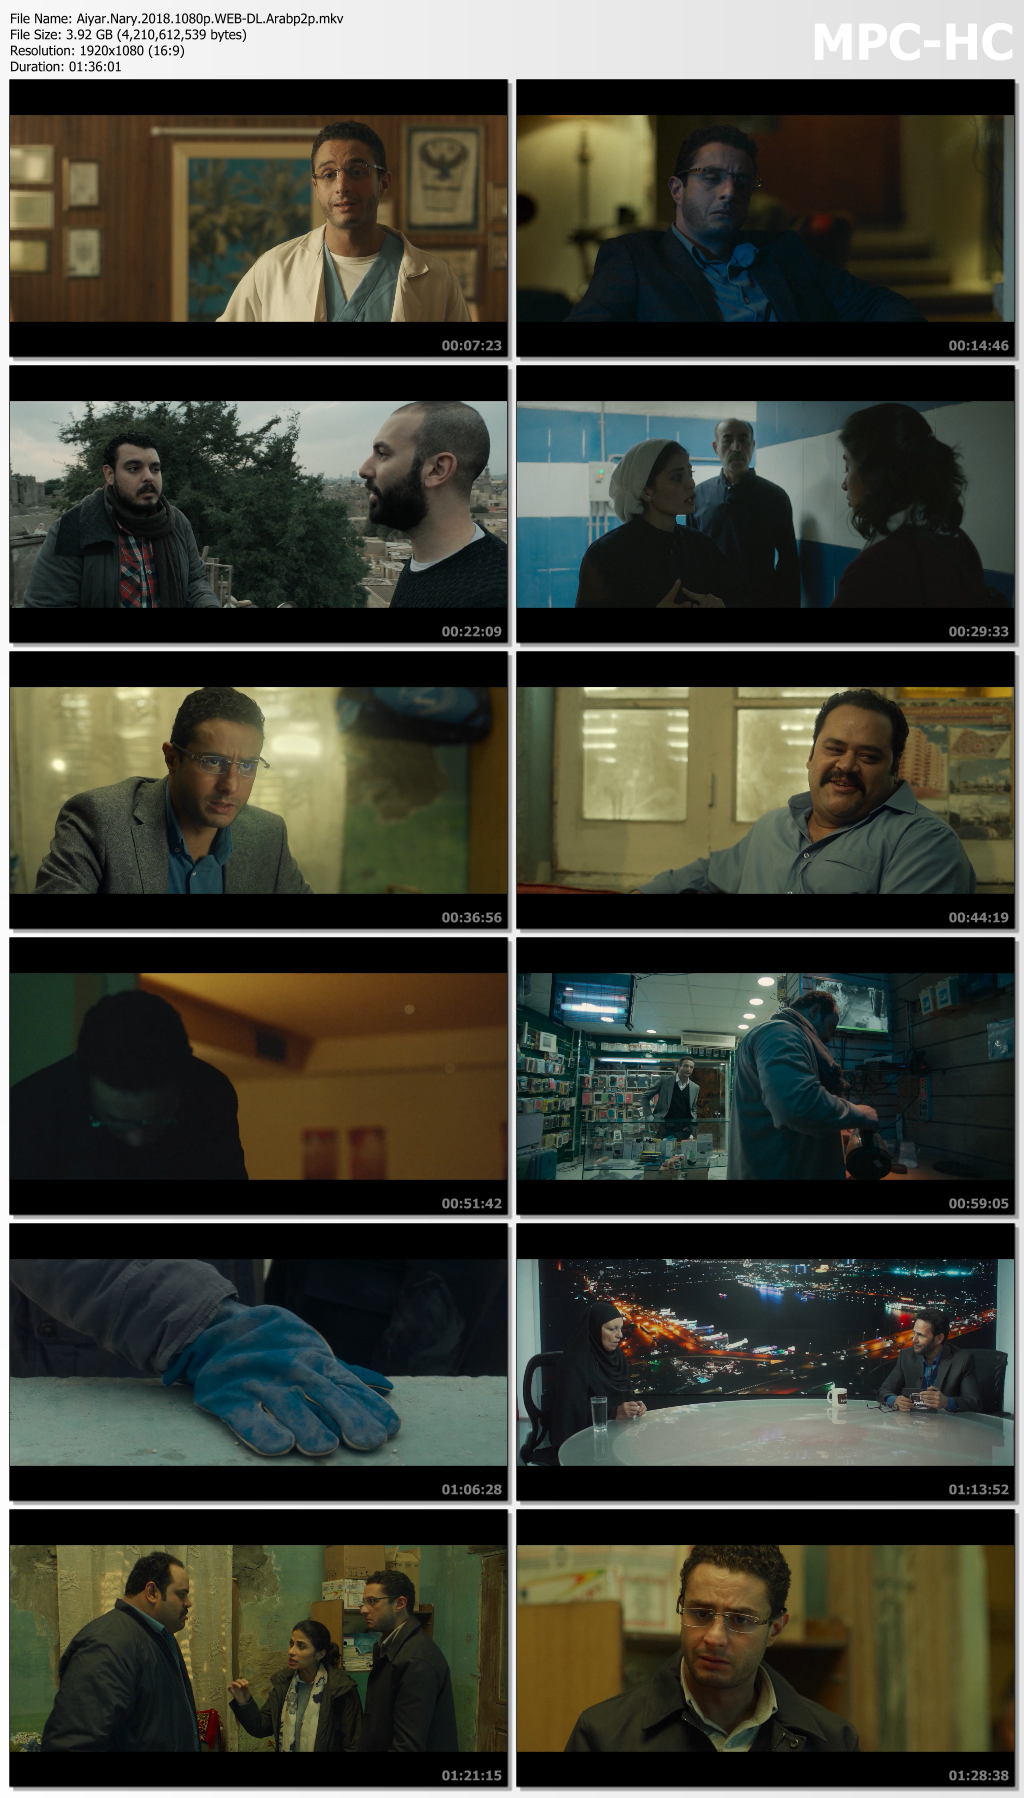 [فيلم][تورنت][تحميل][عيار ناري][2018][1080p][Web-DL] 6 arabp2p.com